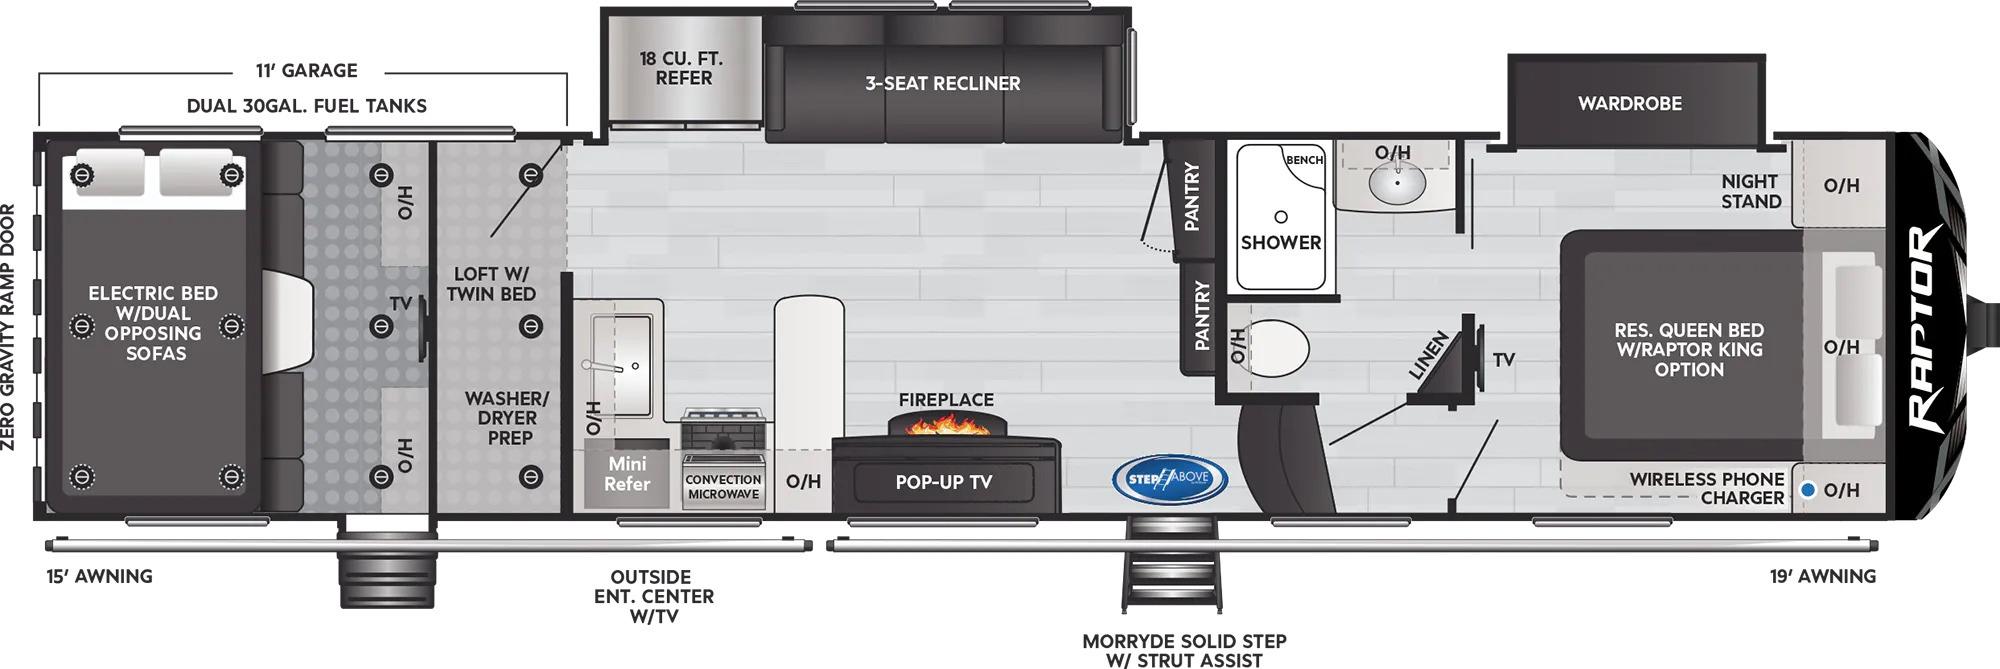 View Floor Plan for 2022 KEYSTONE RAPTOR 351